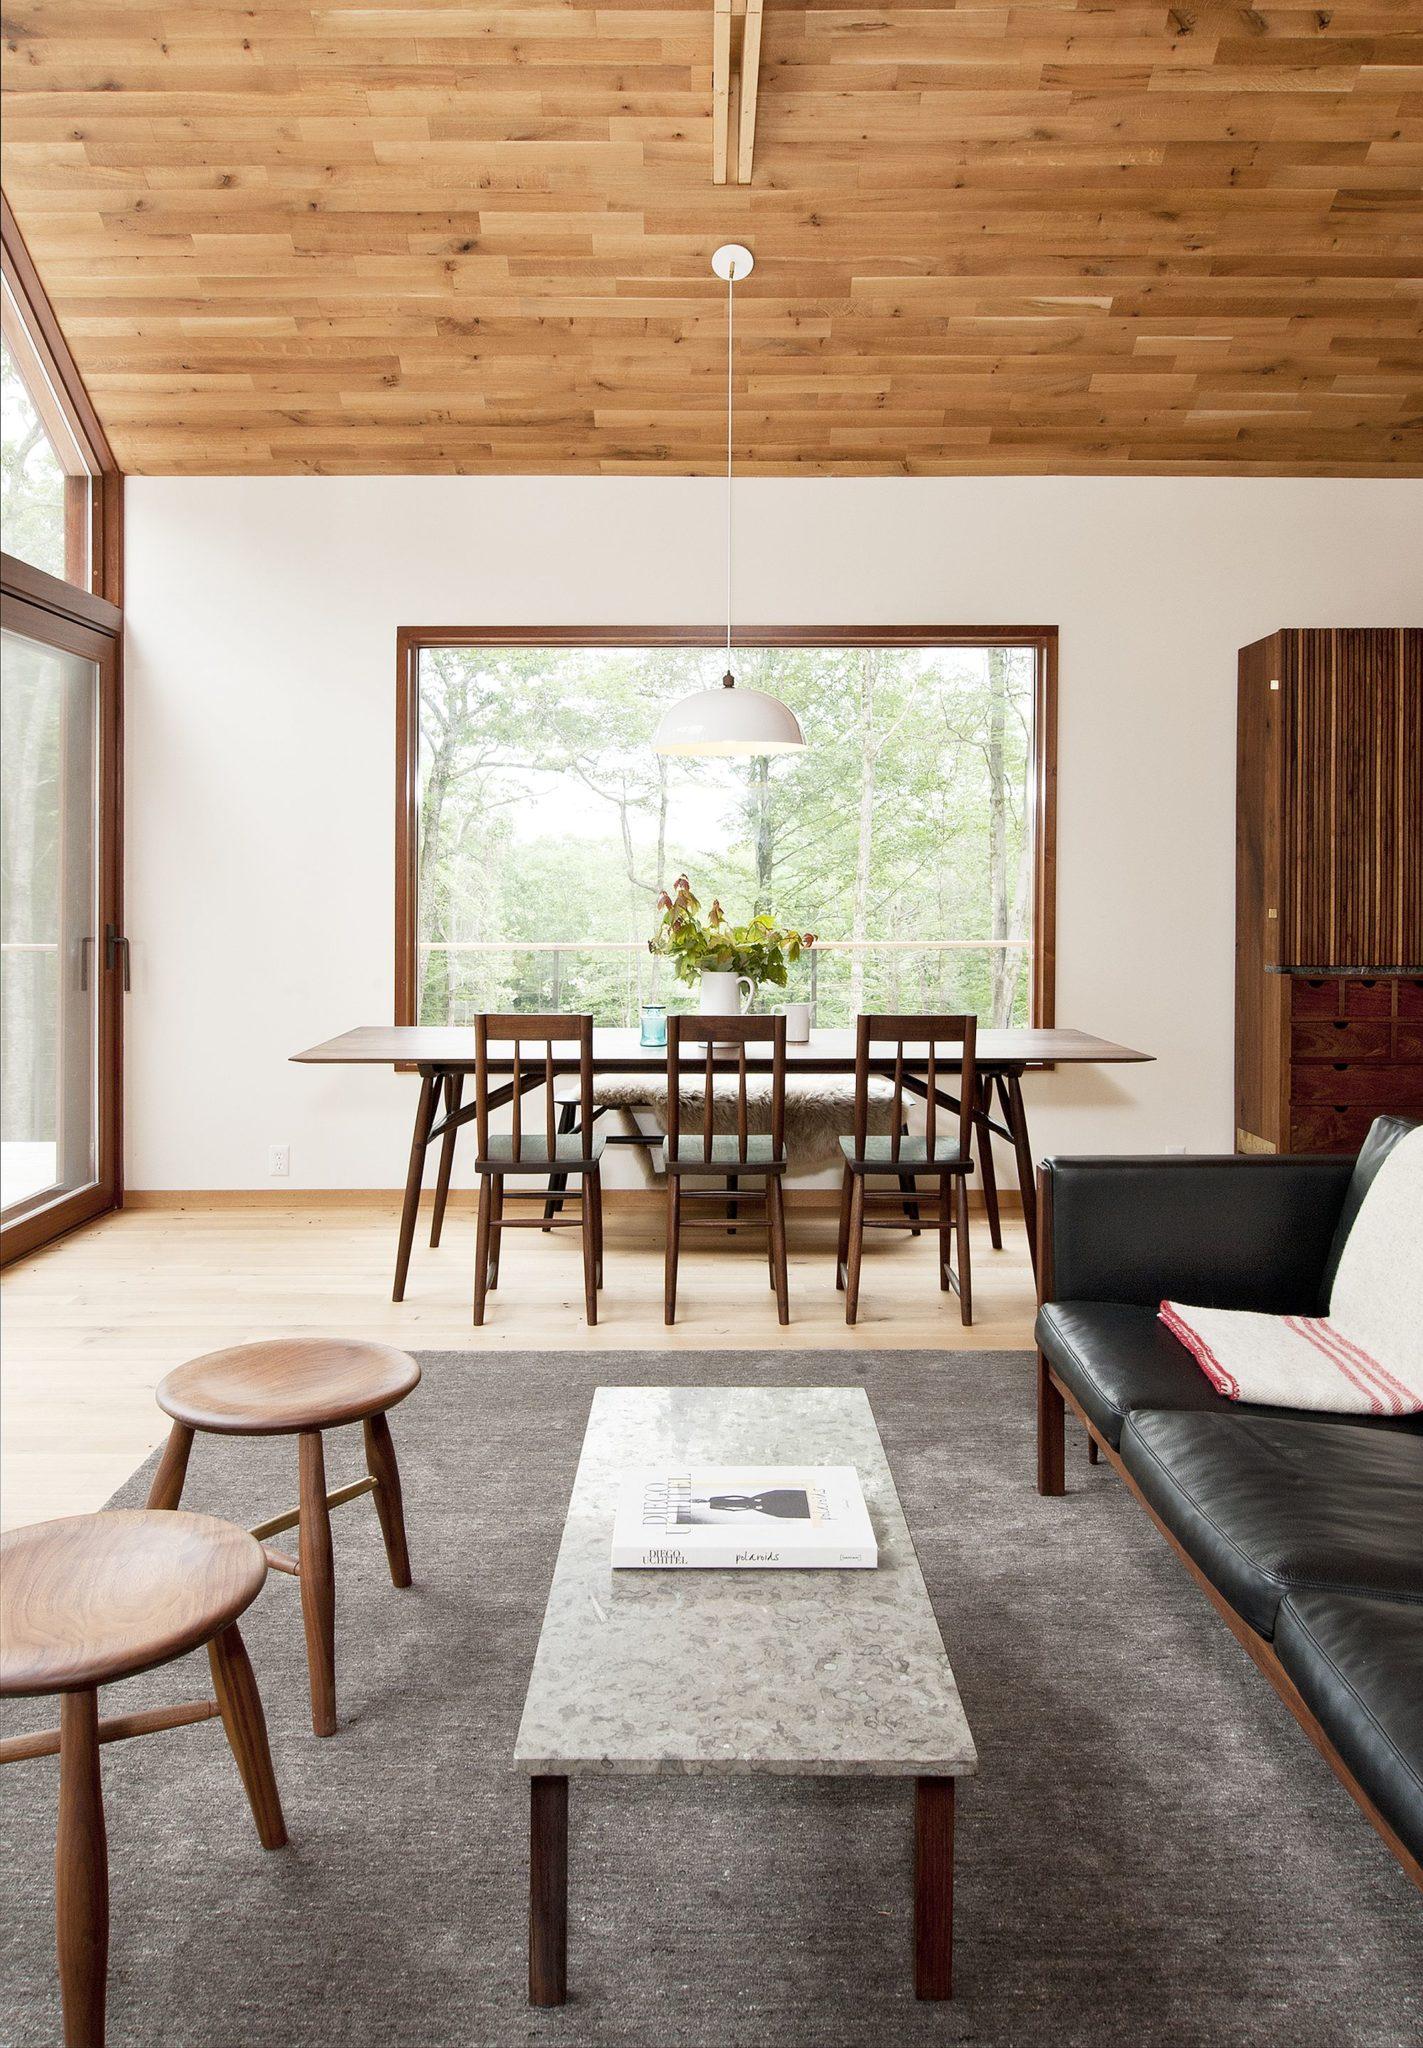 Scandinavian-and-mid-century-aesthetics-combined-inside-the-stylish-New-York-Cabin